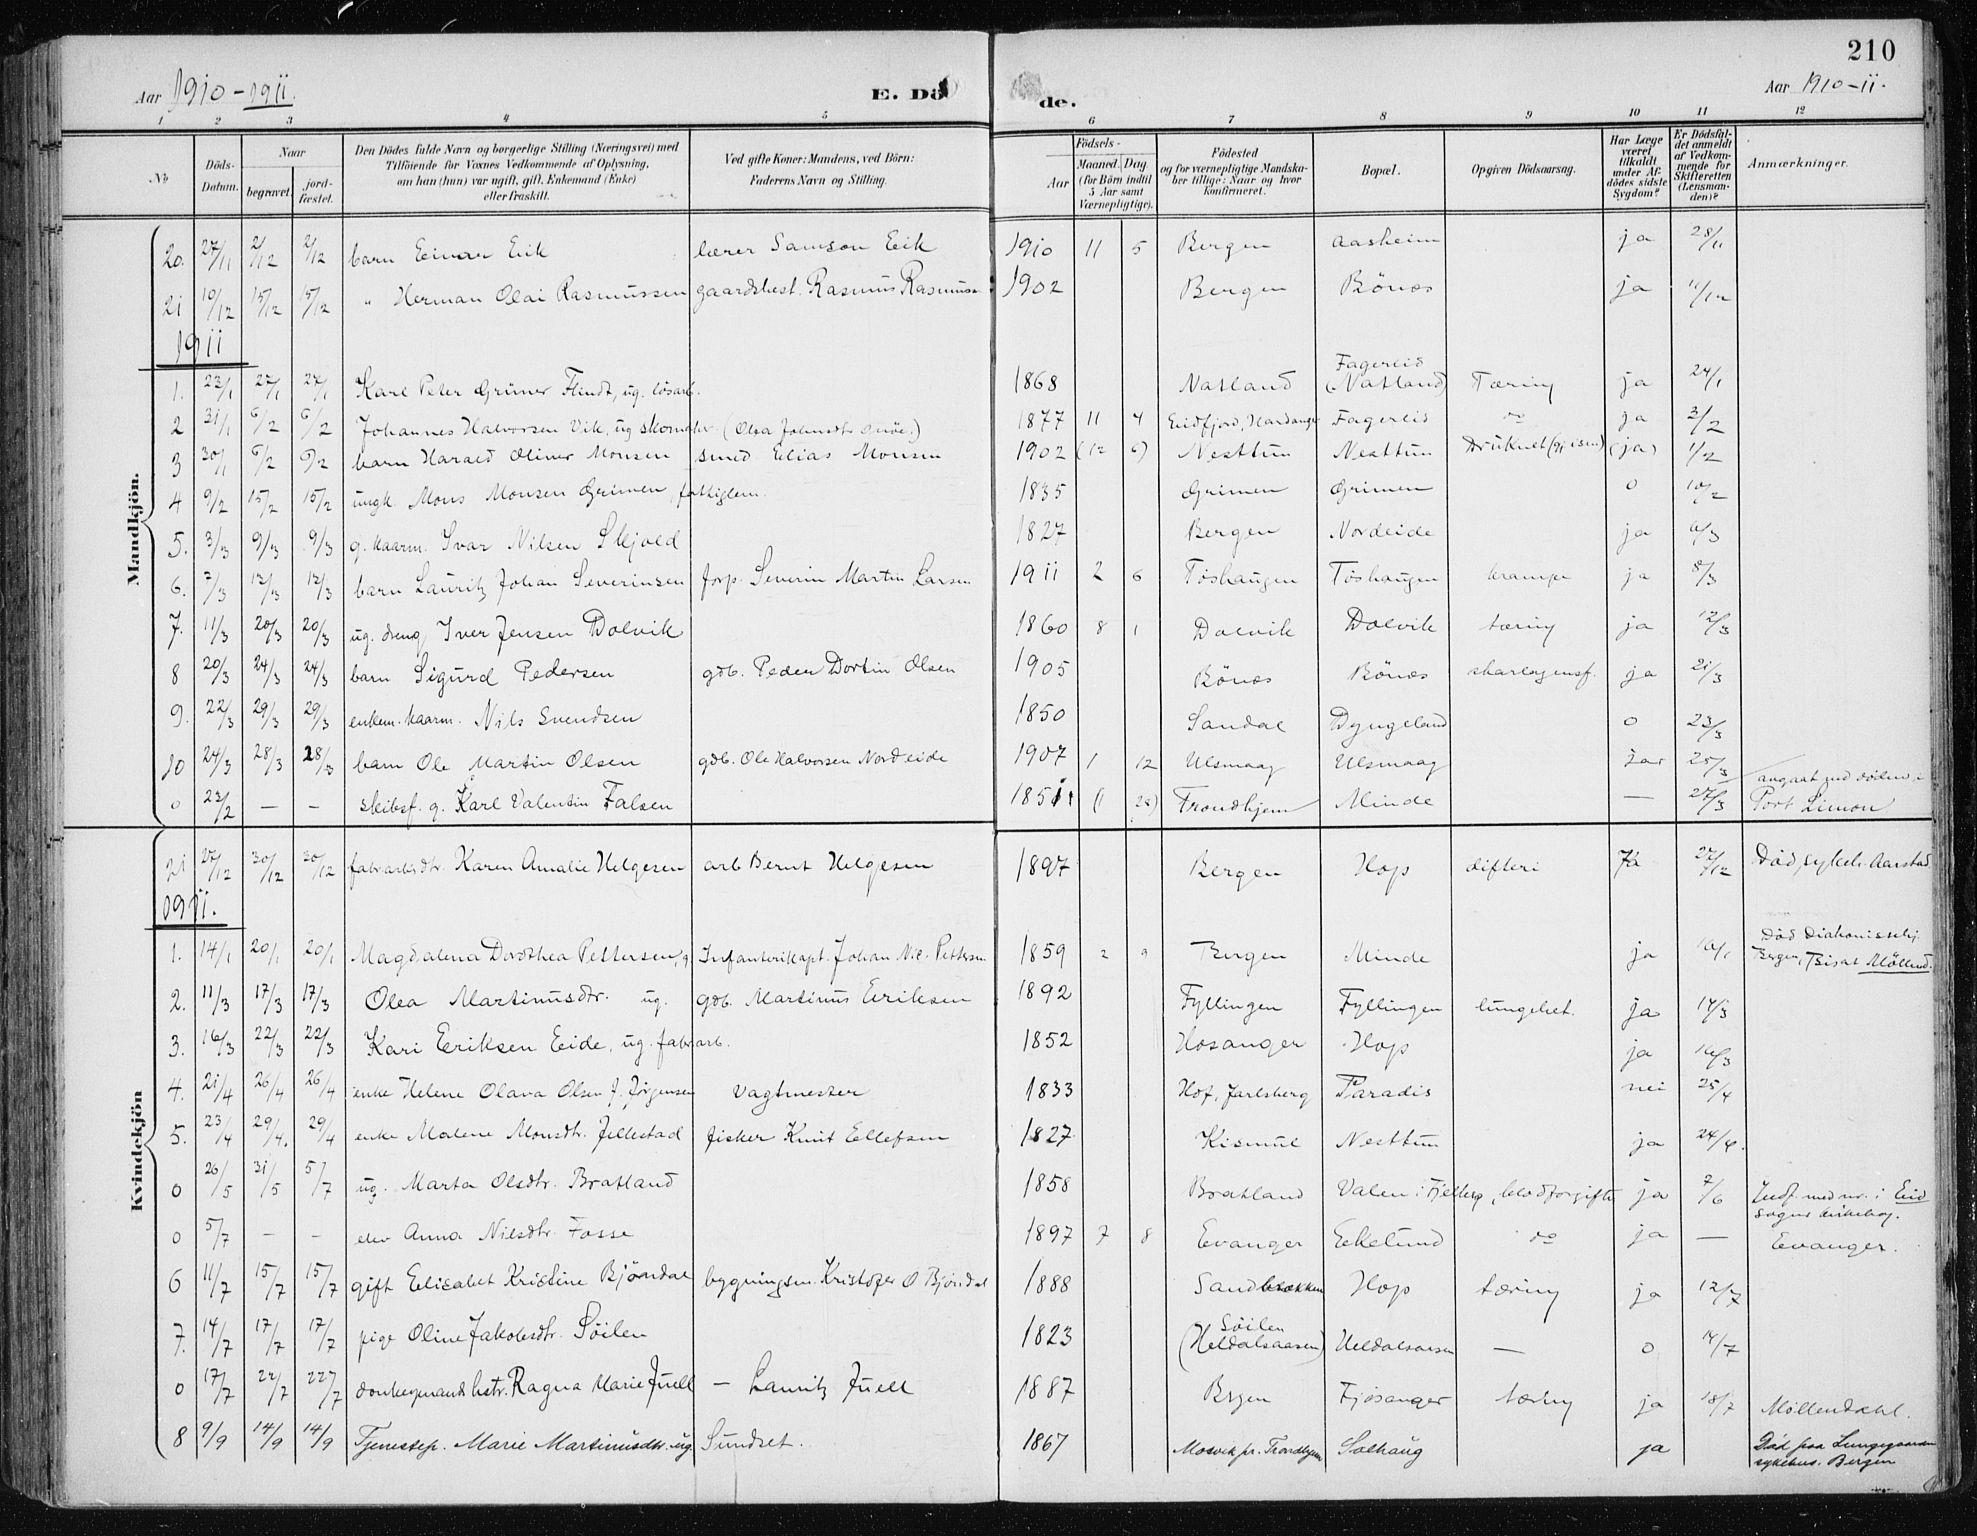 SAB, Fana Sokneprestembete, H/Haa/Haai/L0003: Ministerialbok nr. I 3, 1900-1912, s. 210